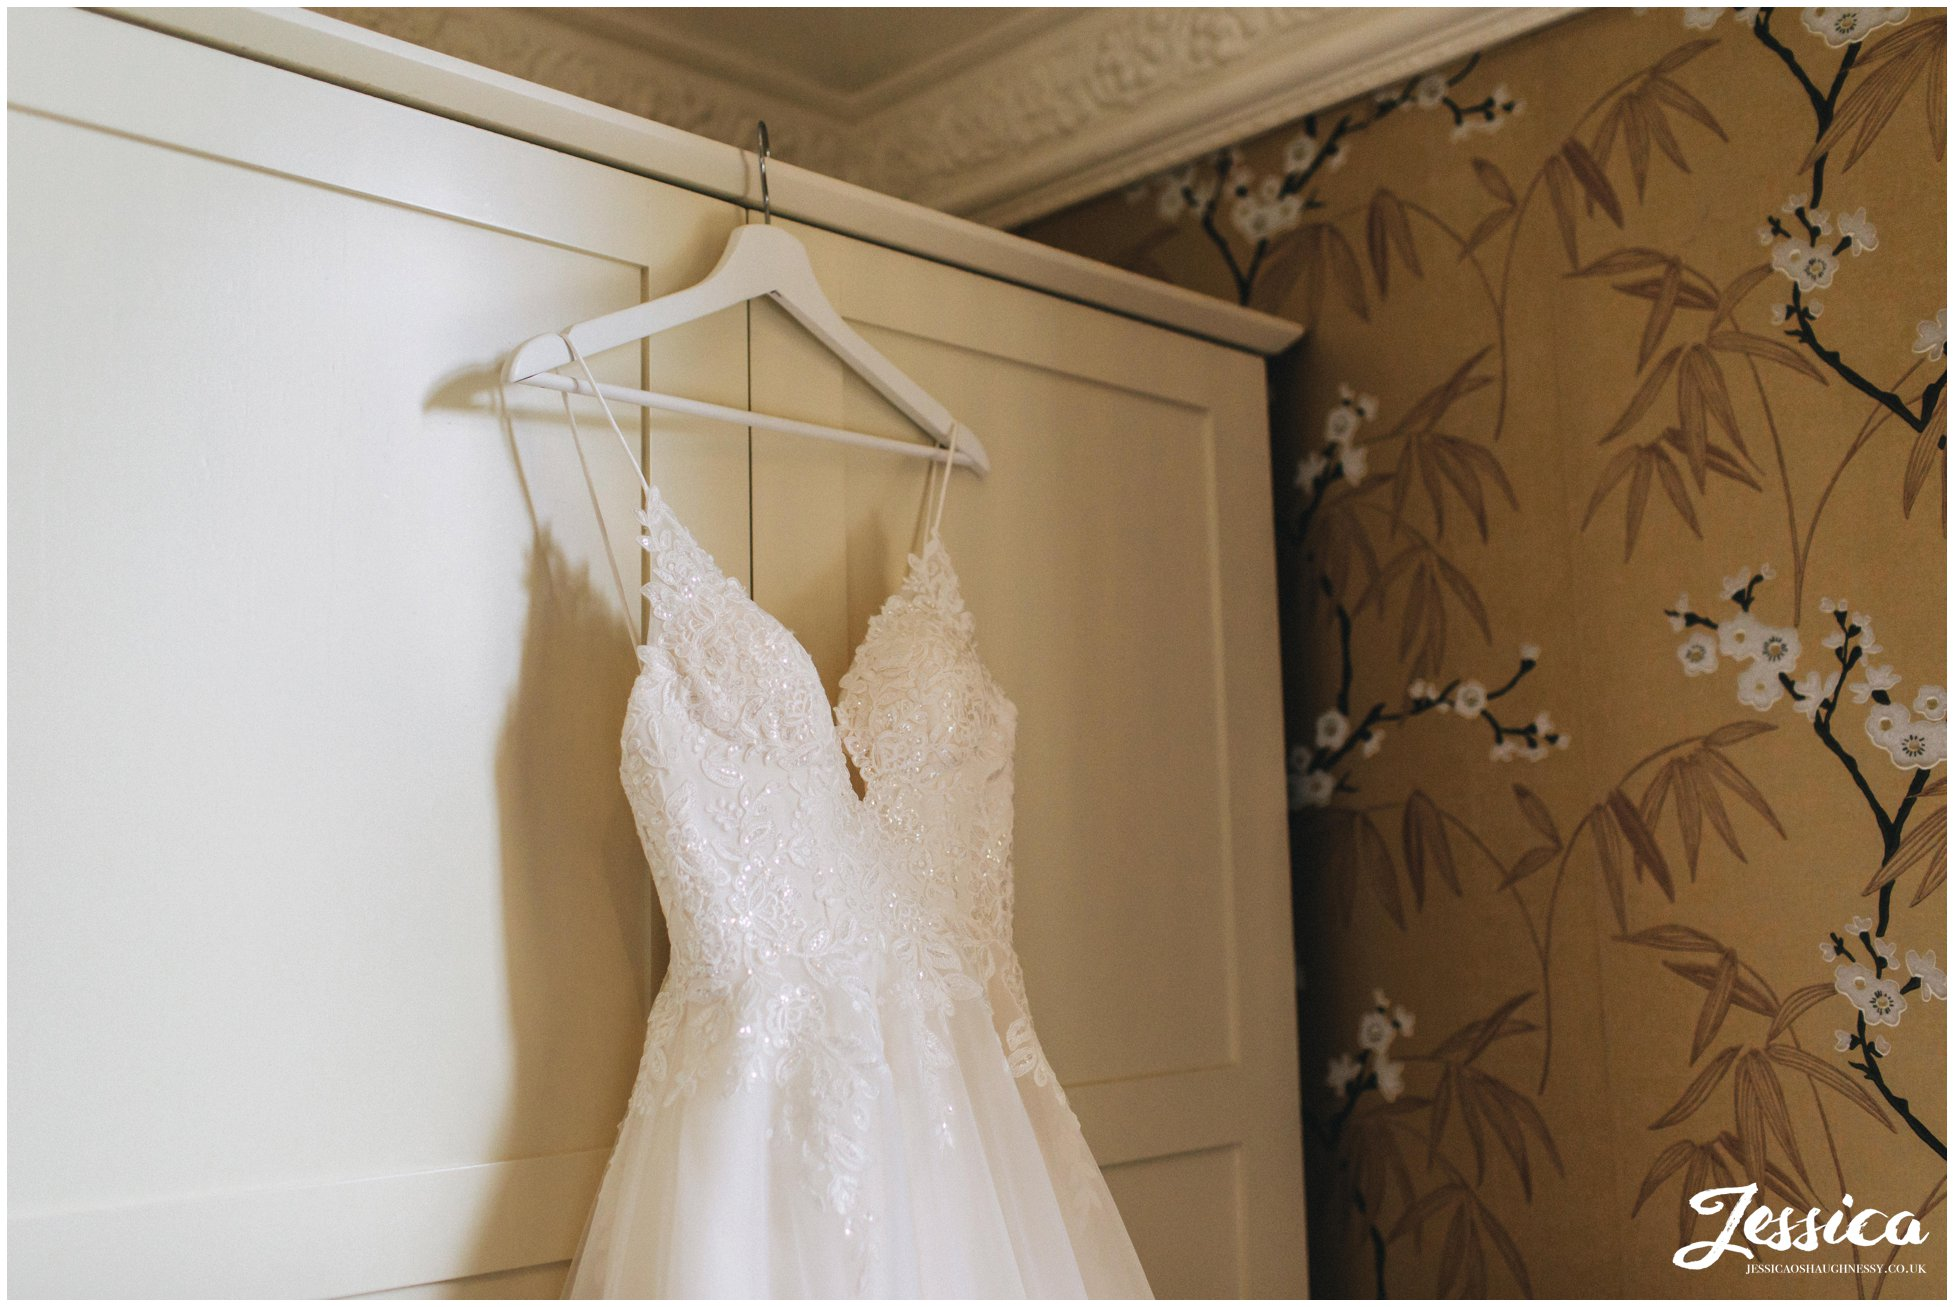 Bride's dress hanging on the wardrobe